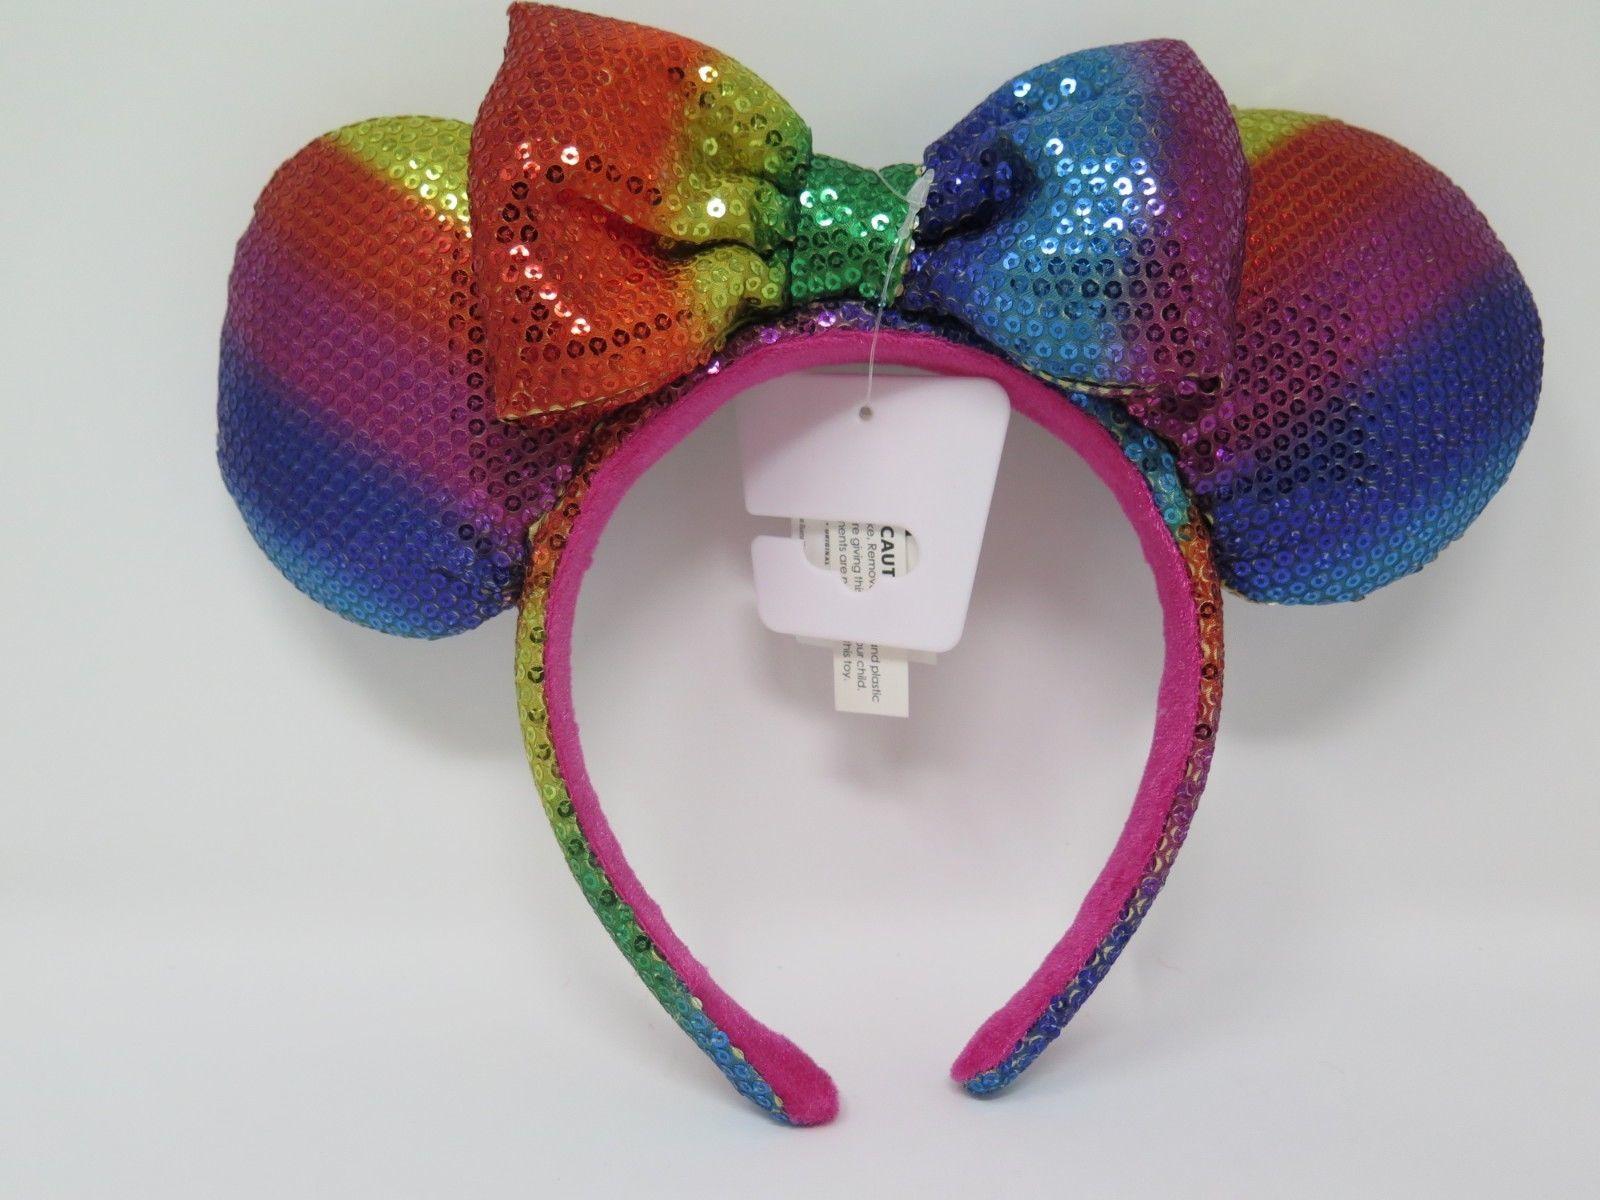 Disney Parks Polka Dot Mickey Gift Blue Sequins Minnie Mouse Ears Teal Headband